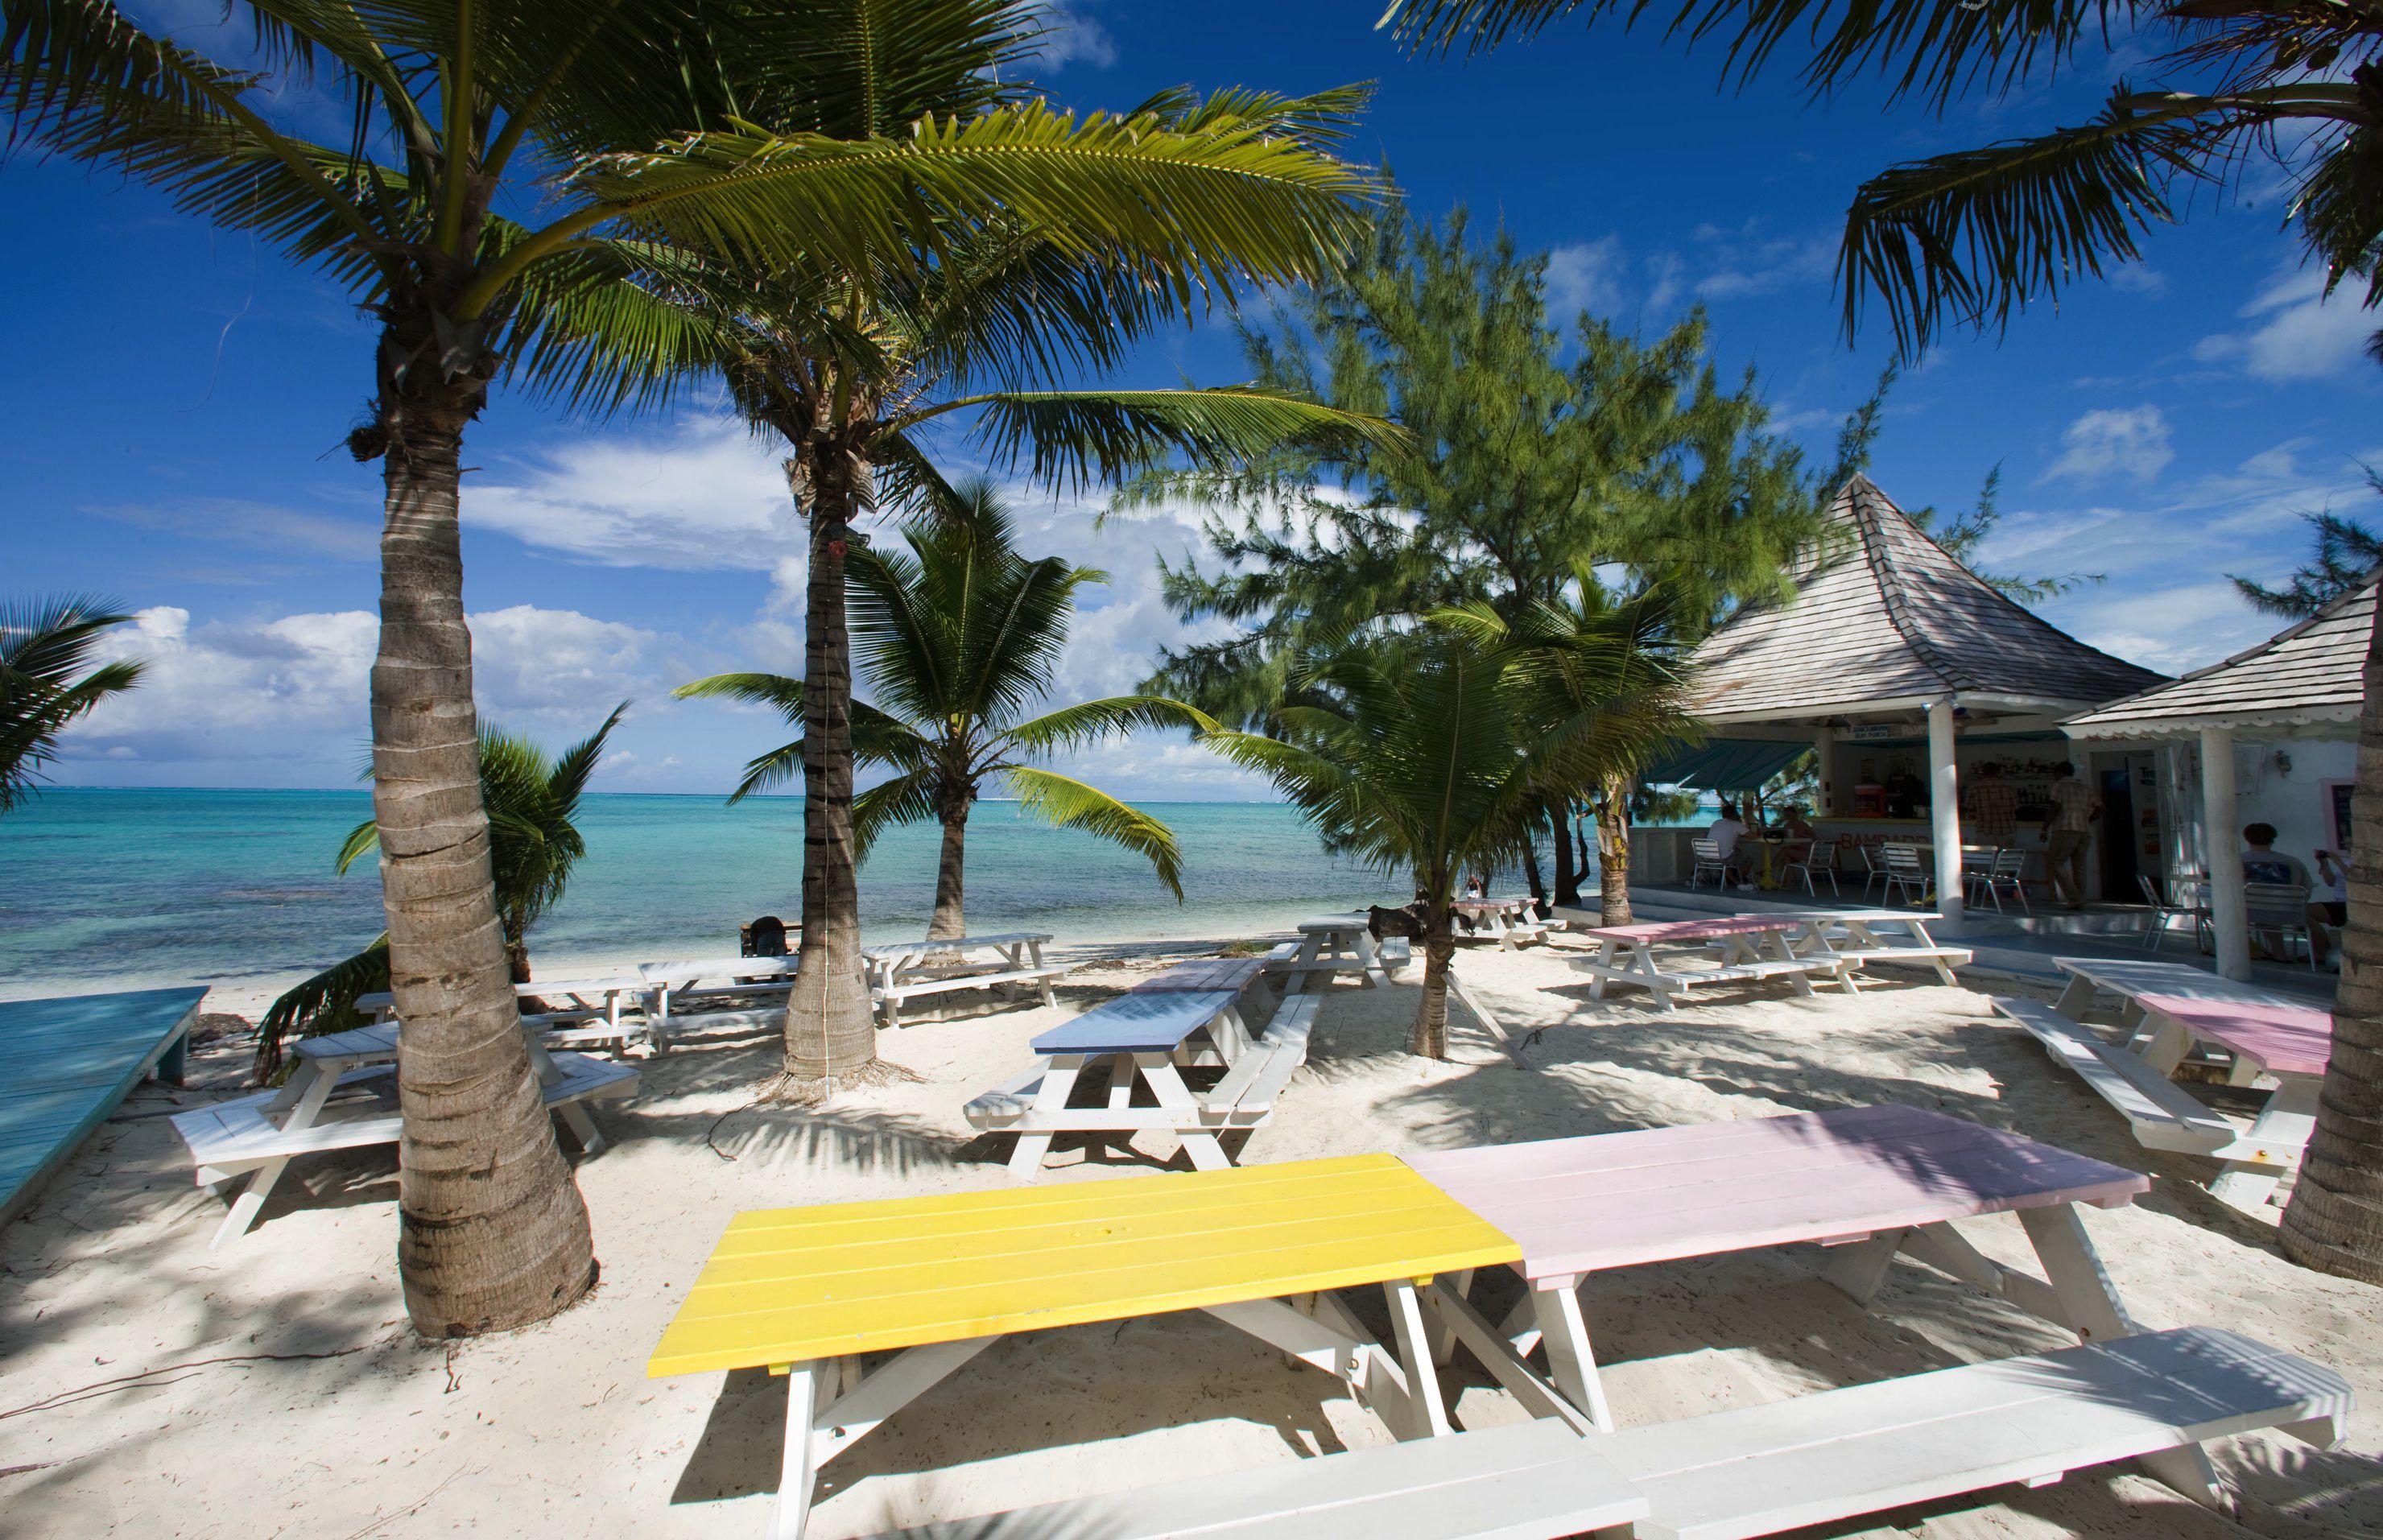 Da Conch Shack and Rum Bar, Turks and Caicos